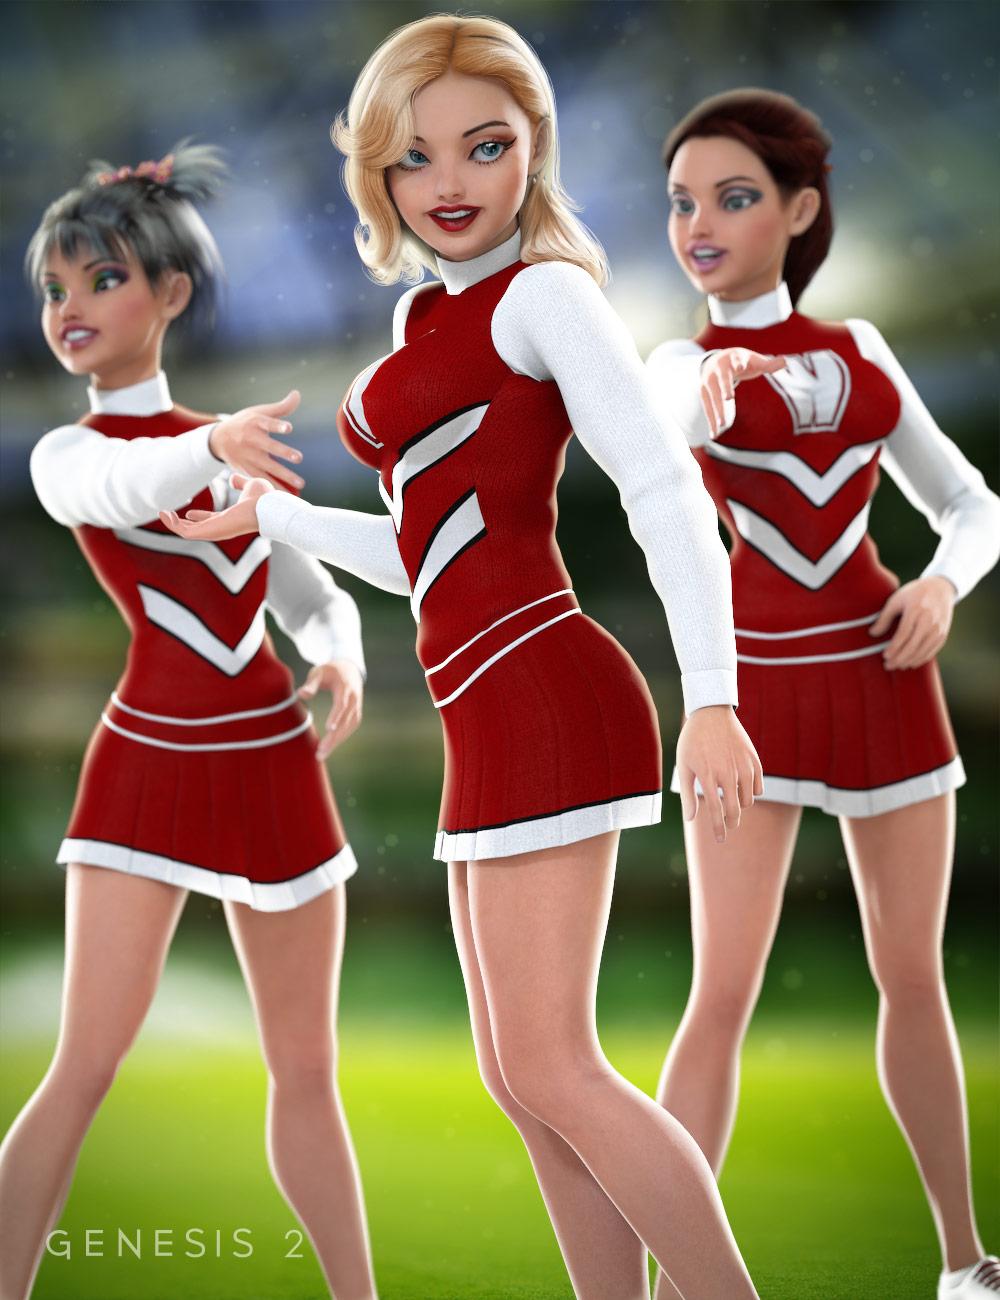 Cheerleader for Genesis 2 Female(s) by: SarsaVal3dart, 3D Models by Daz 3D